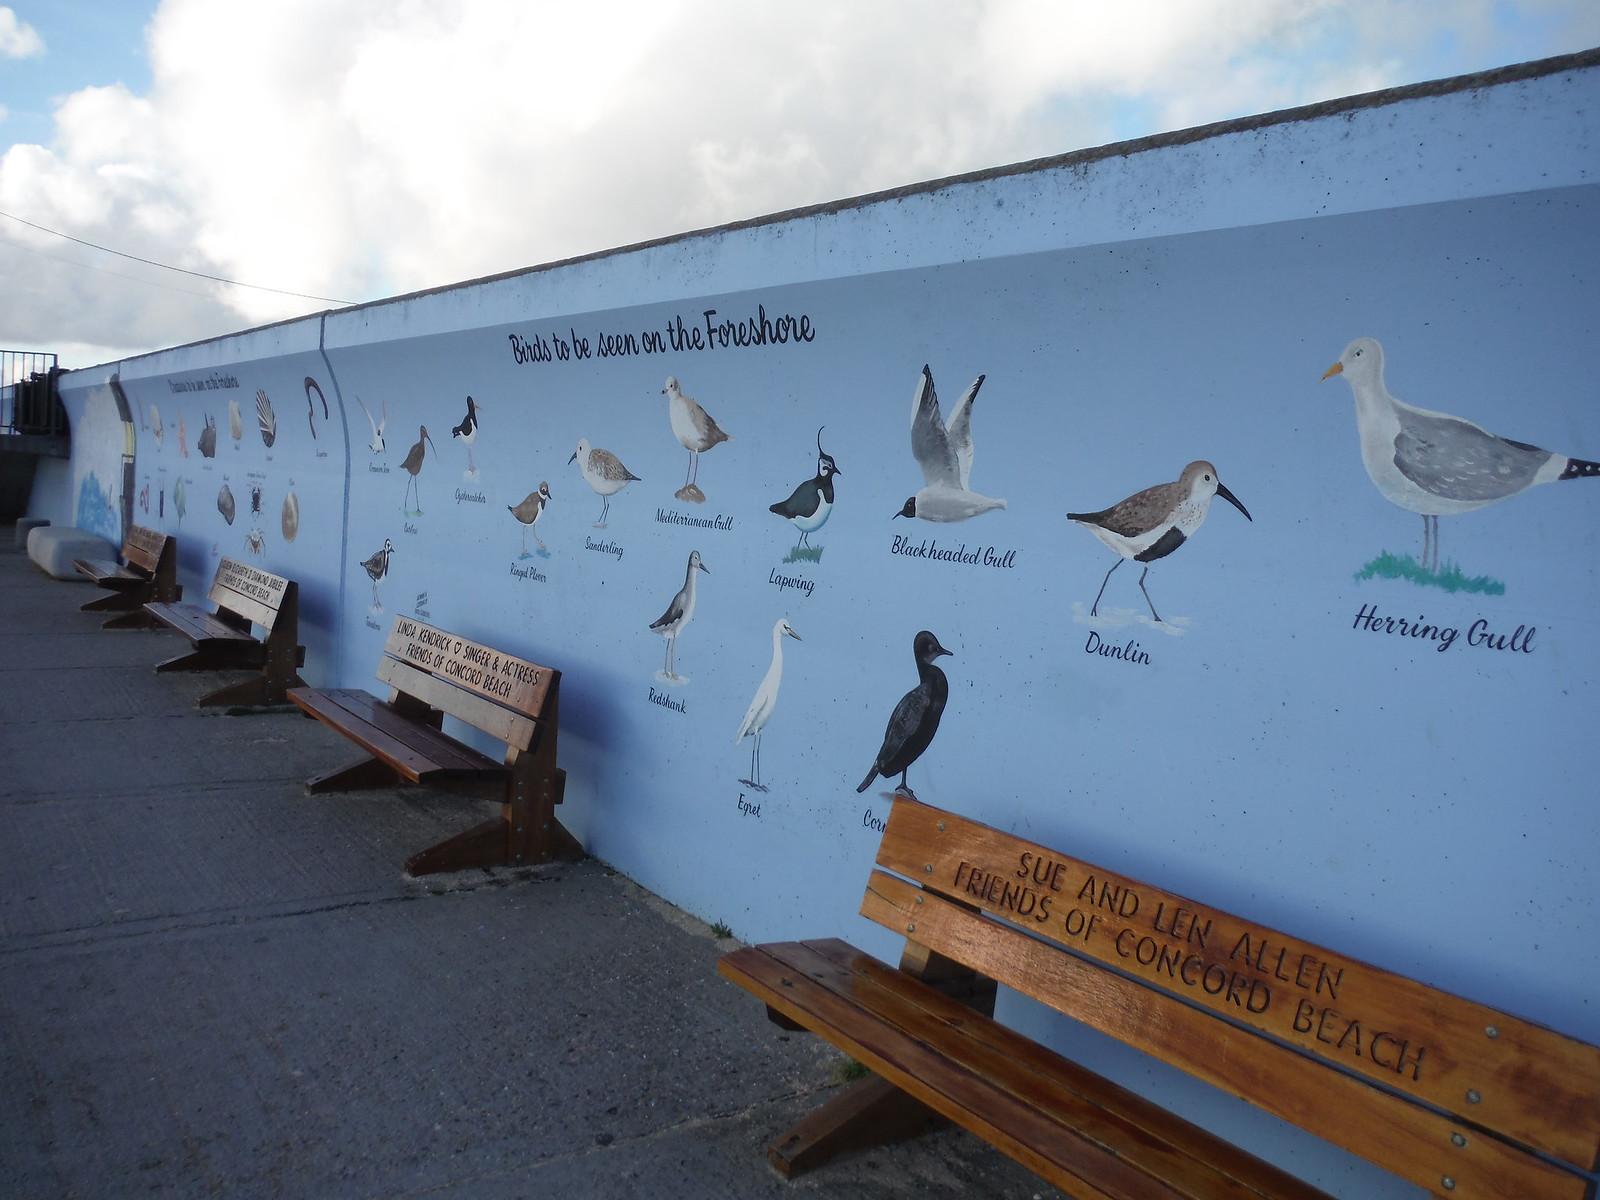 Birds and Shells mural, Concord Beach, Canvey Island SWC Walk 258 Benfleet Circular (via Canvey Island)